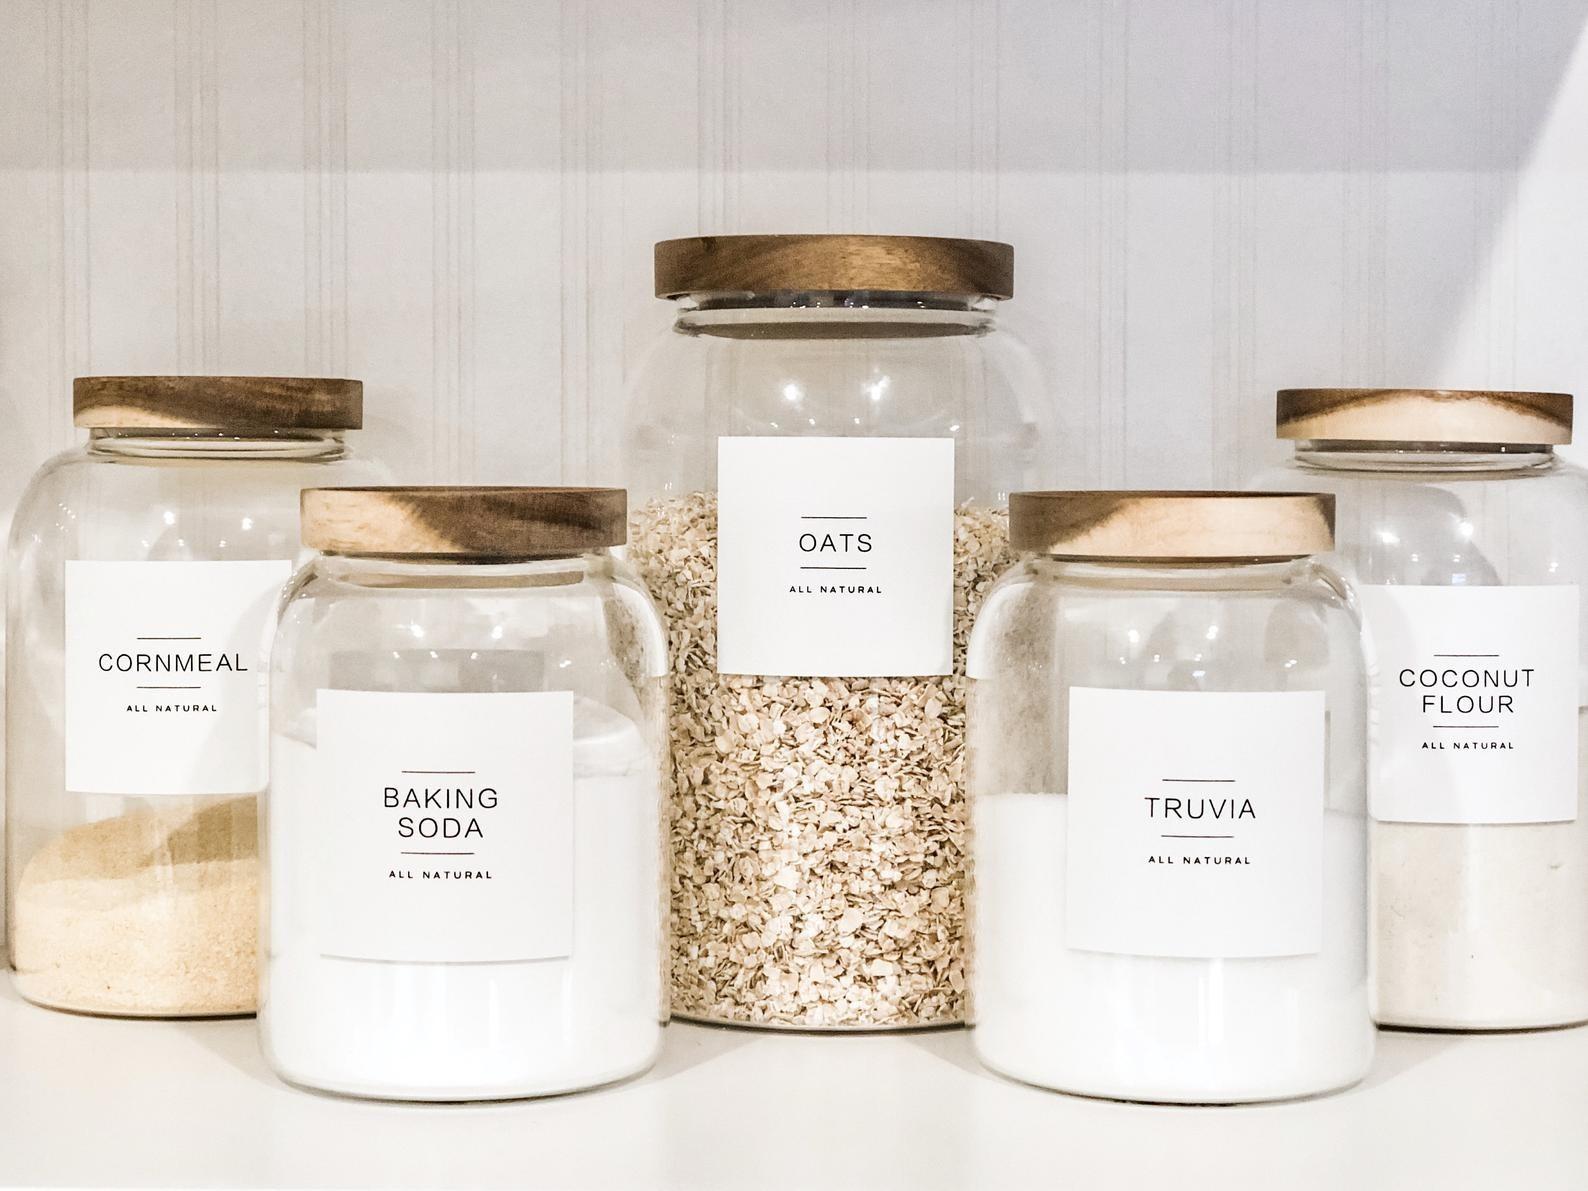 Cornmeal, baking soda, oats, truvia, and coconut flour labels on glass jars